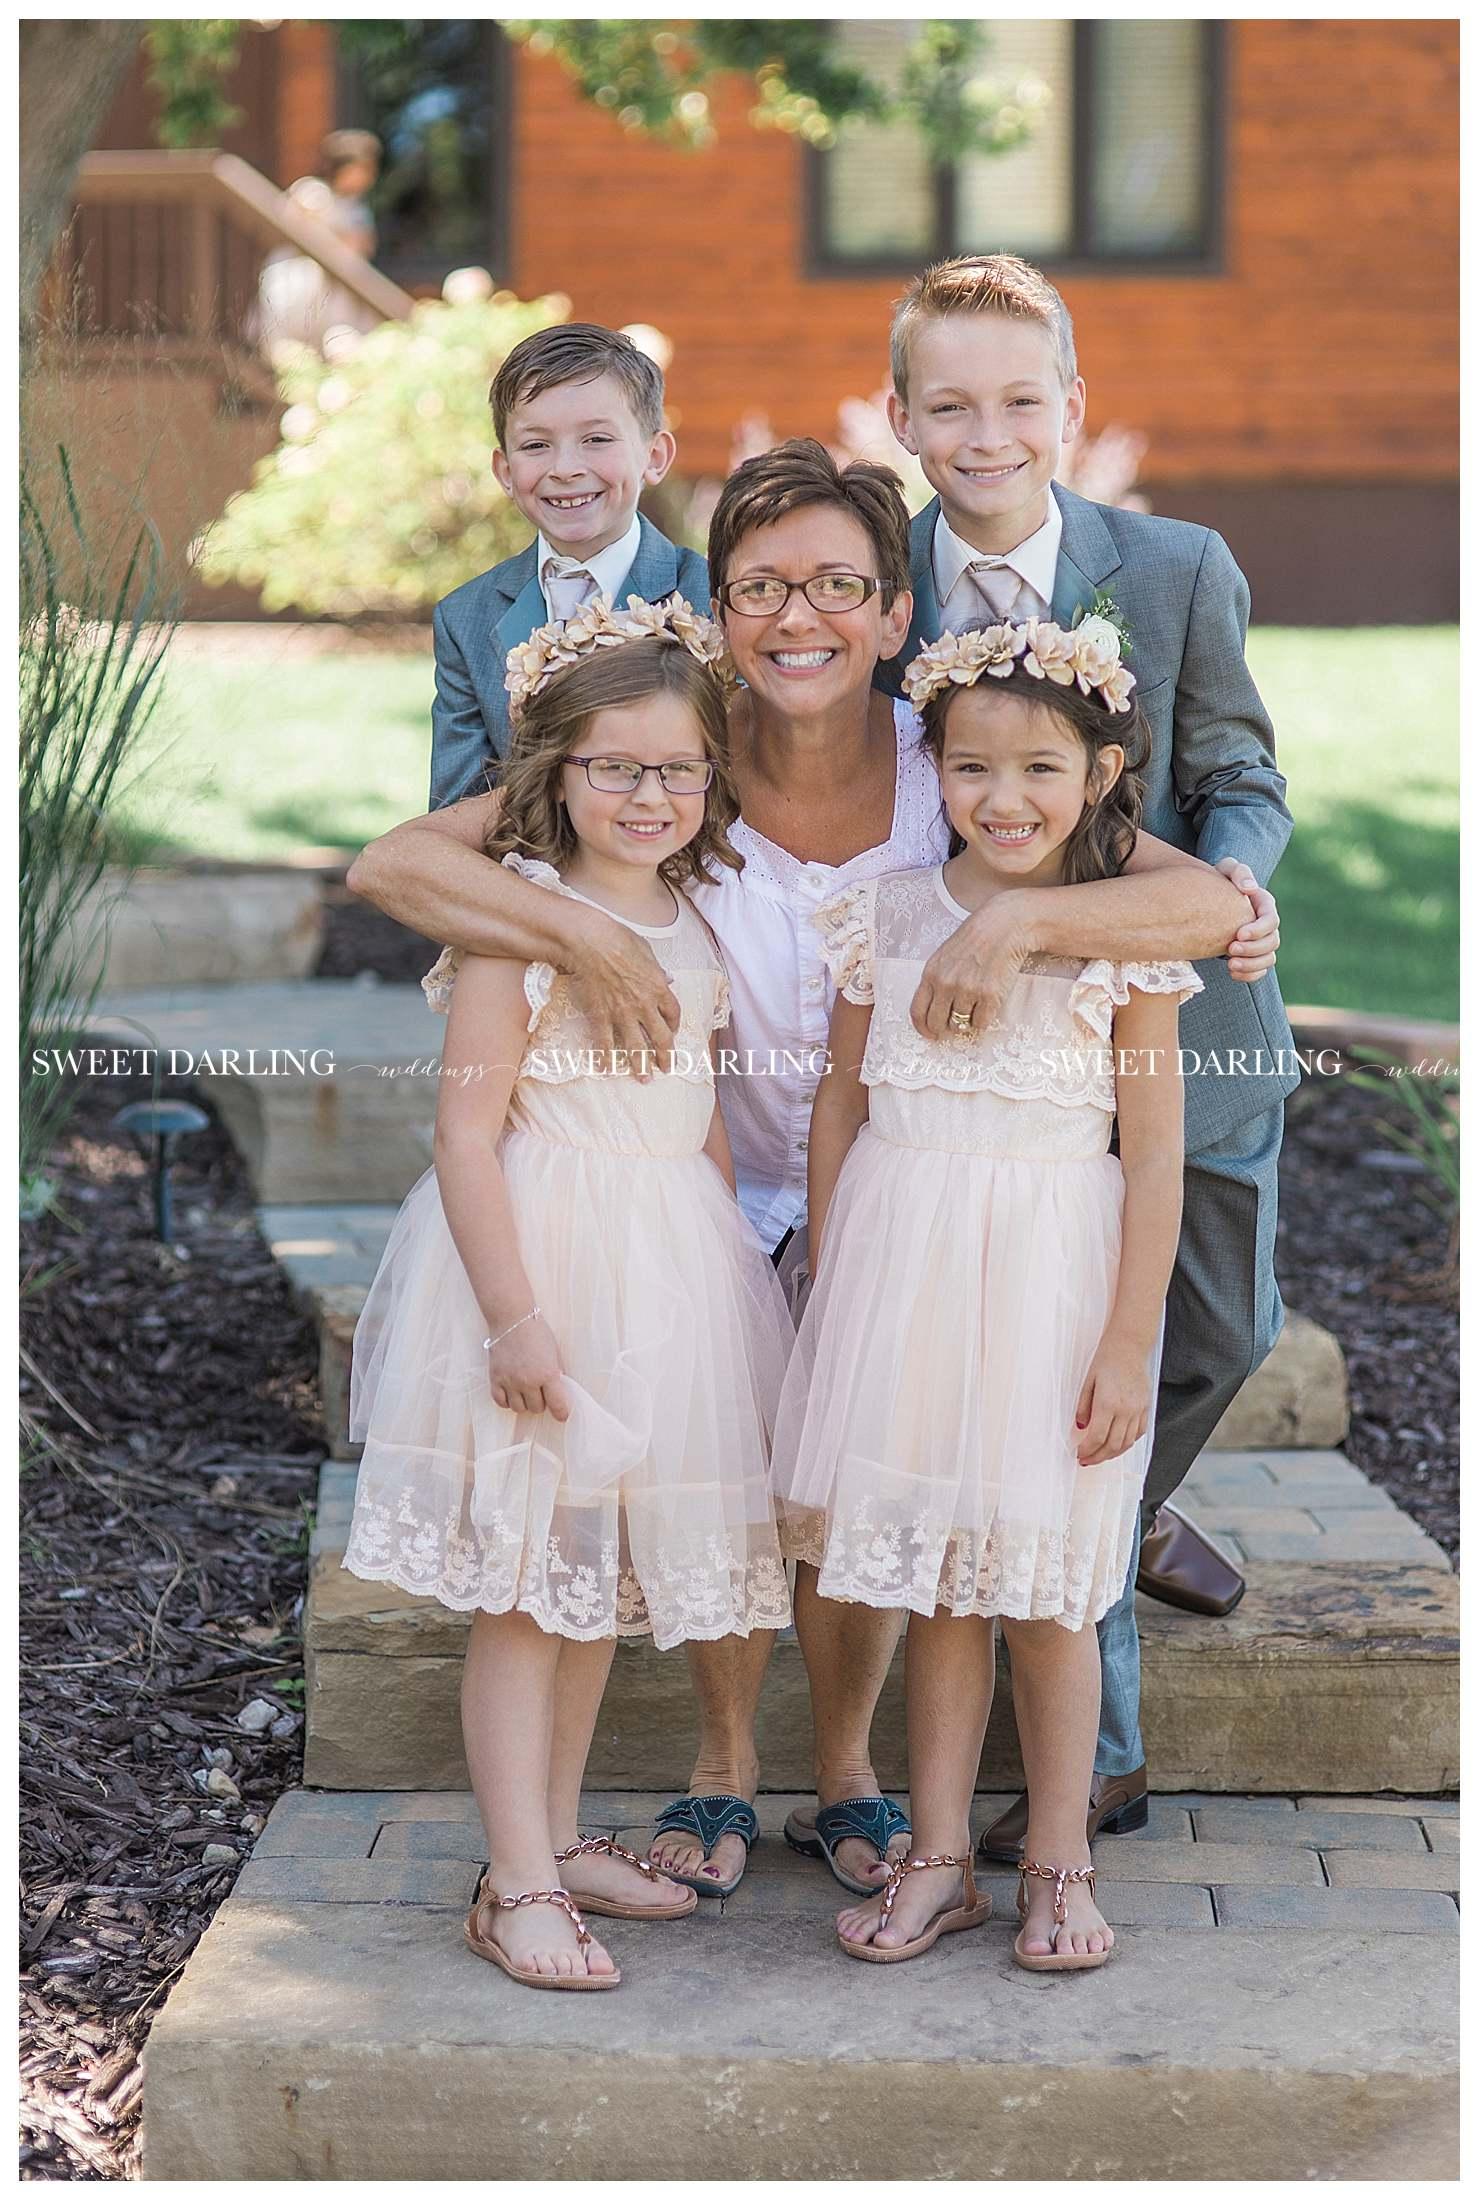 Grandma with grandkids at fall wedding